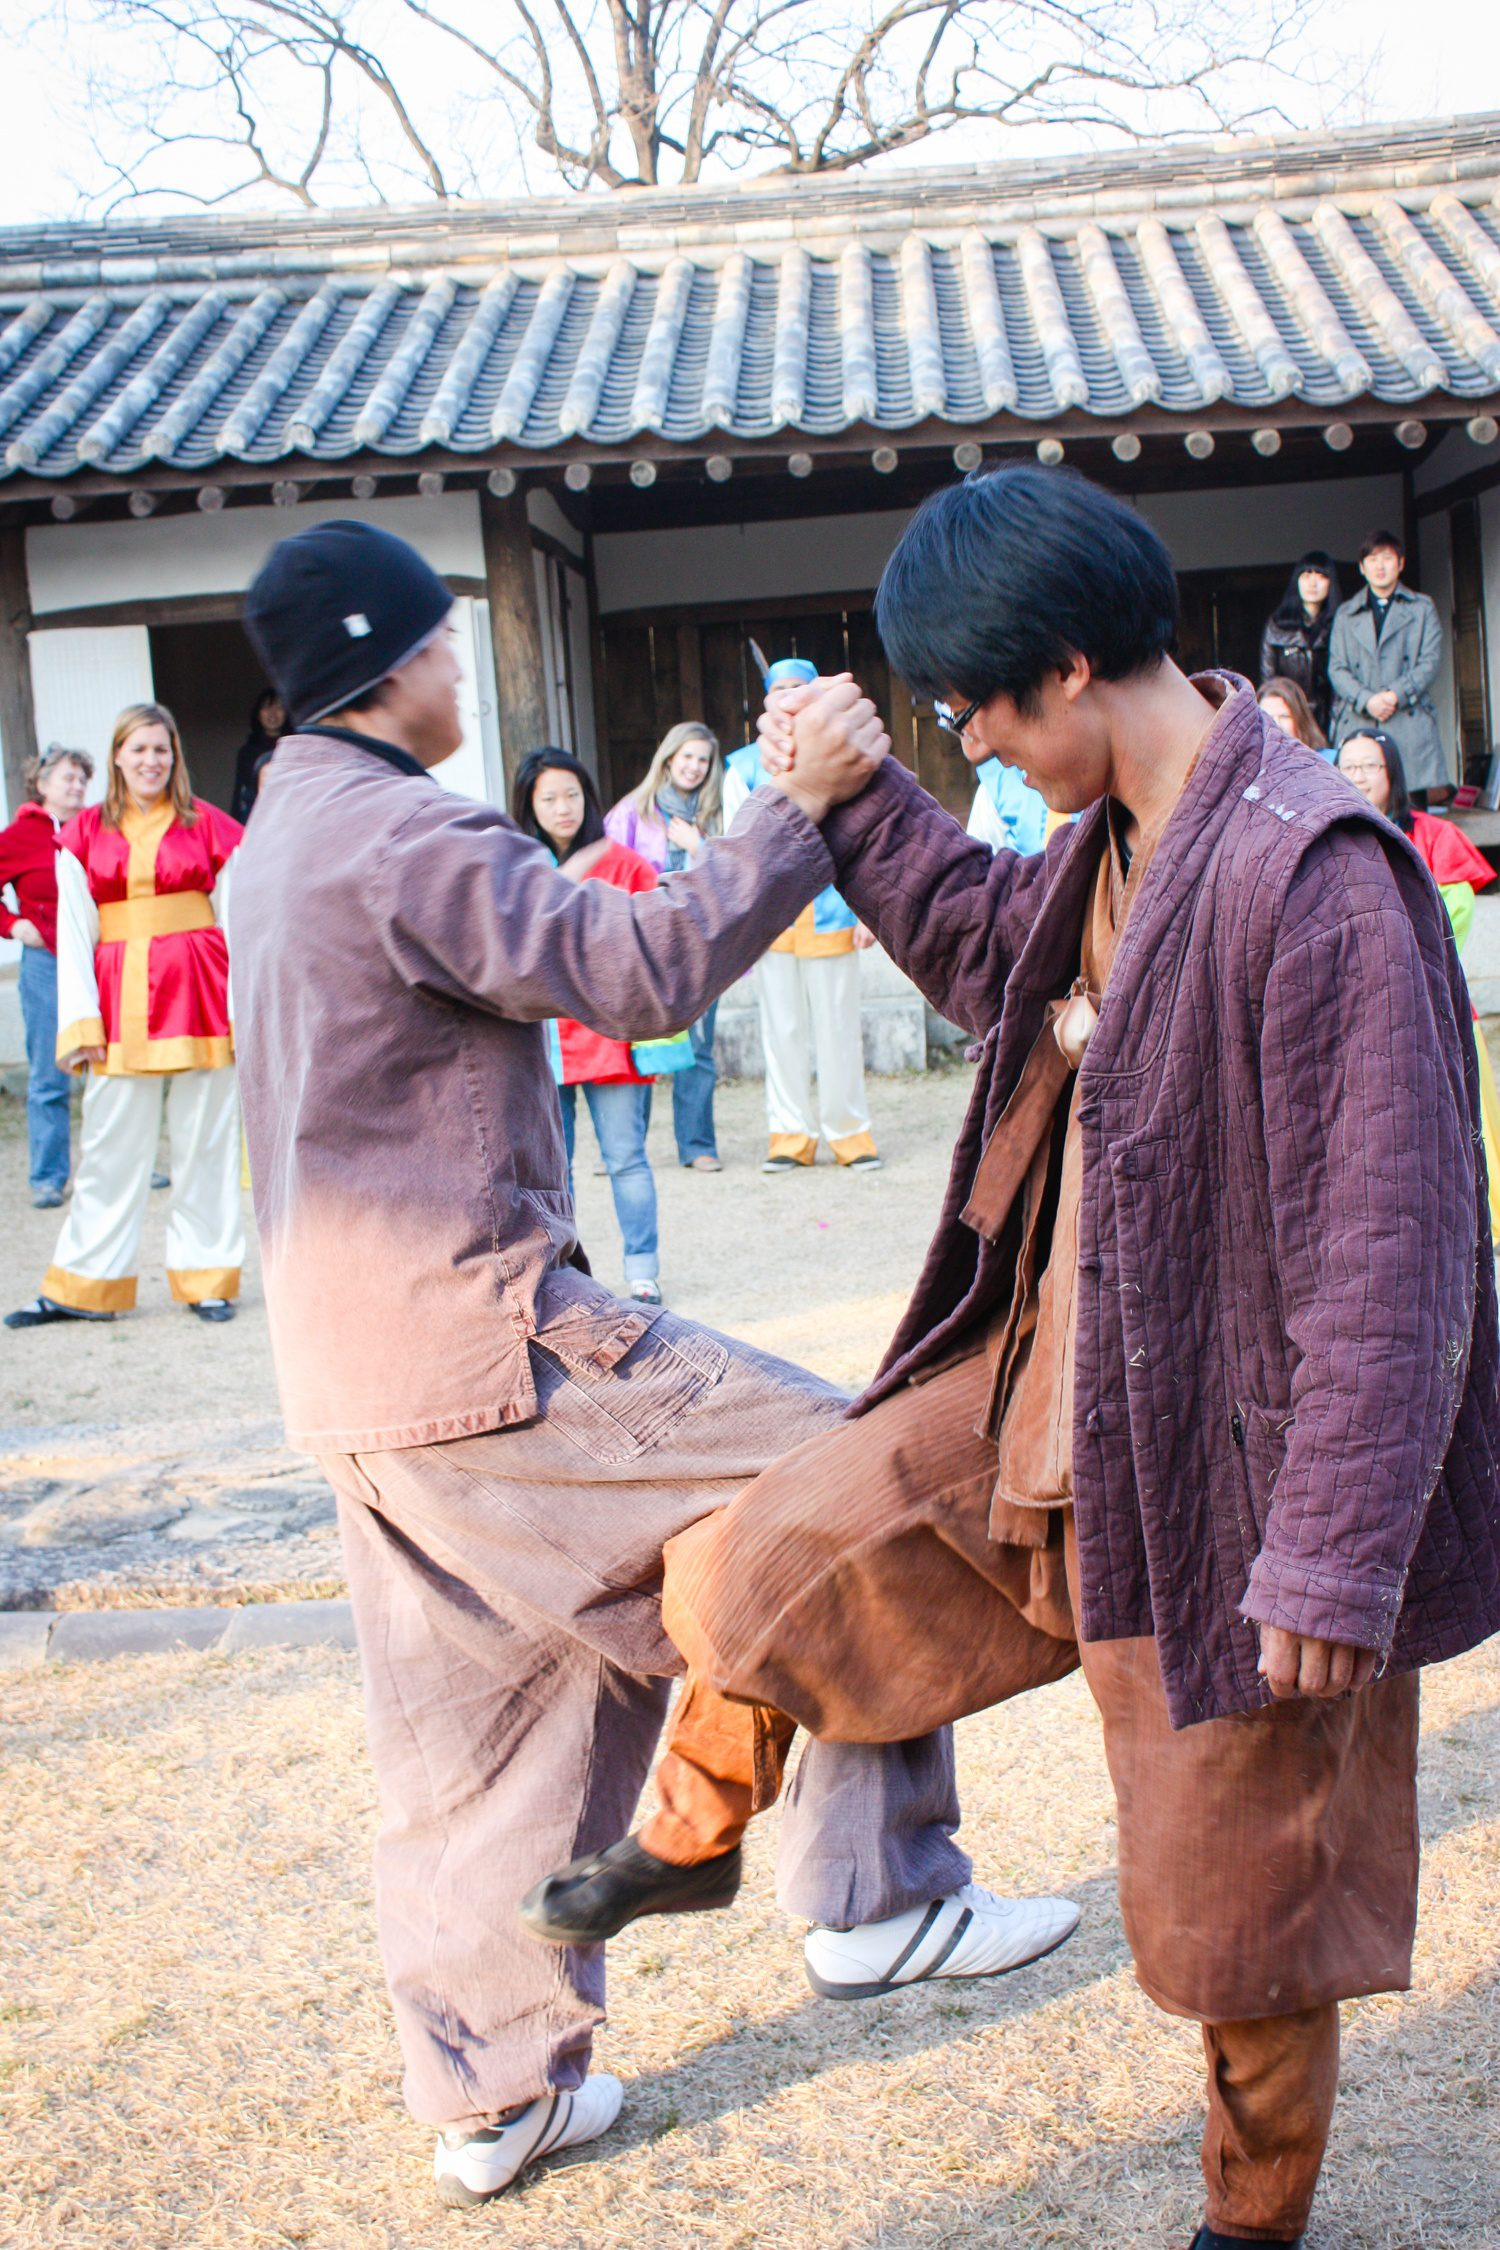 Martial arts at a traditional Korean house experience in Gyeongju, South Korea.